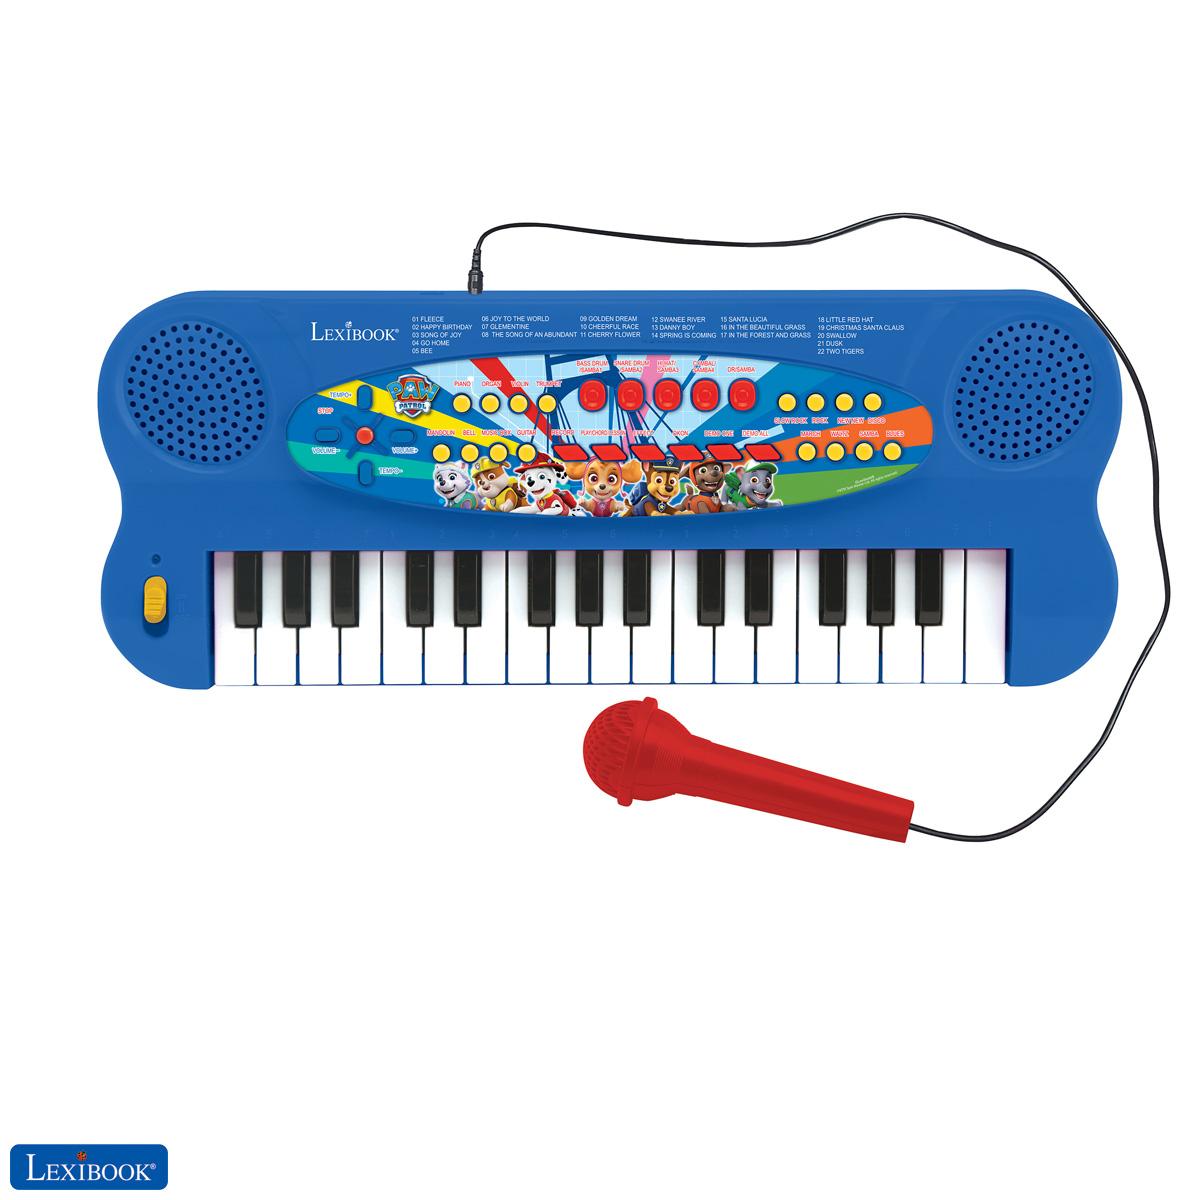 Lexibook - Paw Patrol Electronic Keyboard with Mic (32 keys) (K703PA)